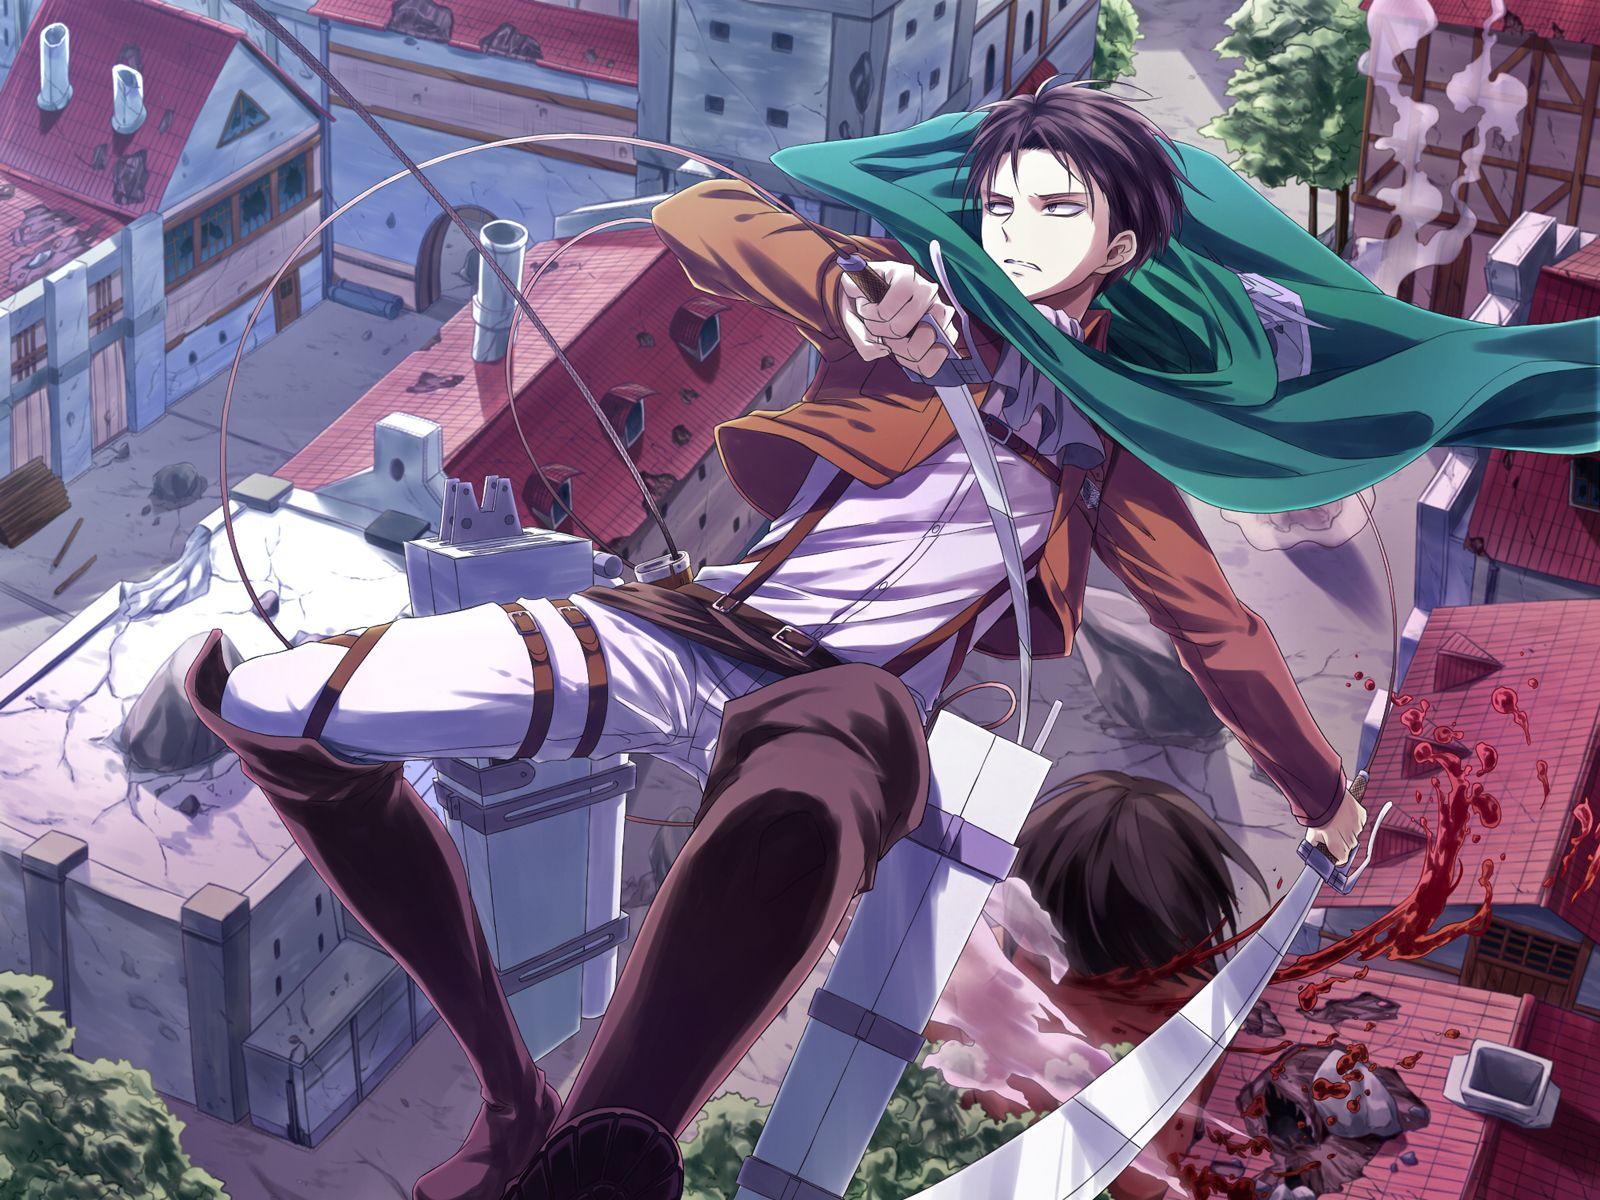 Shingeki no Kyojin (Attack on titan) Wallpaper: AOT Wallpapers